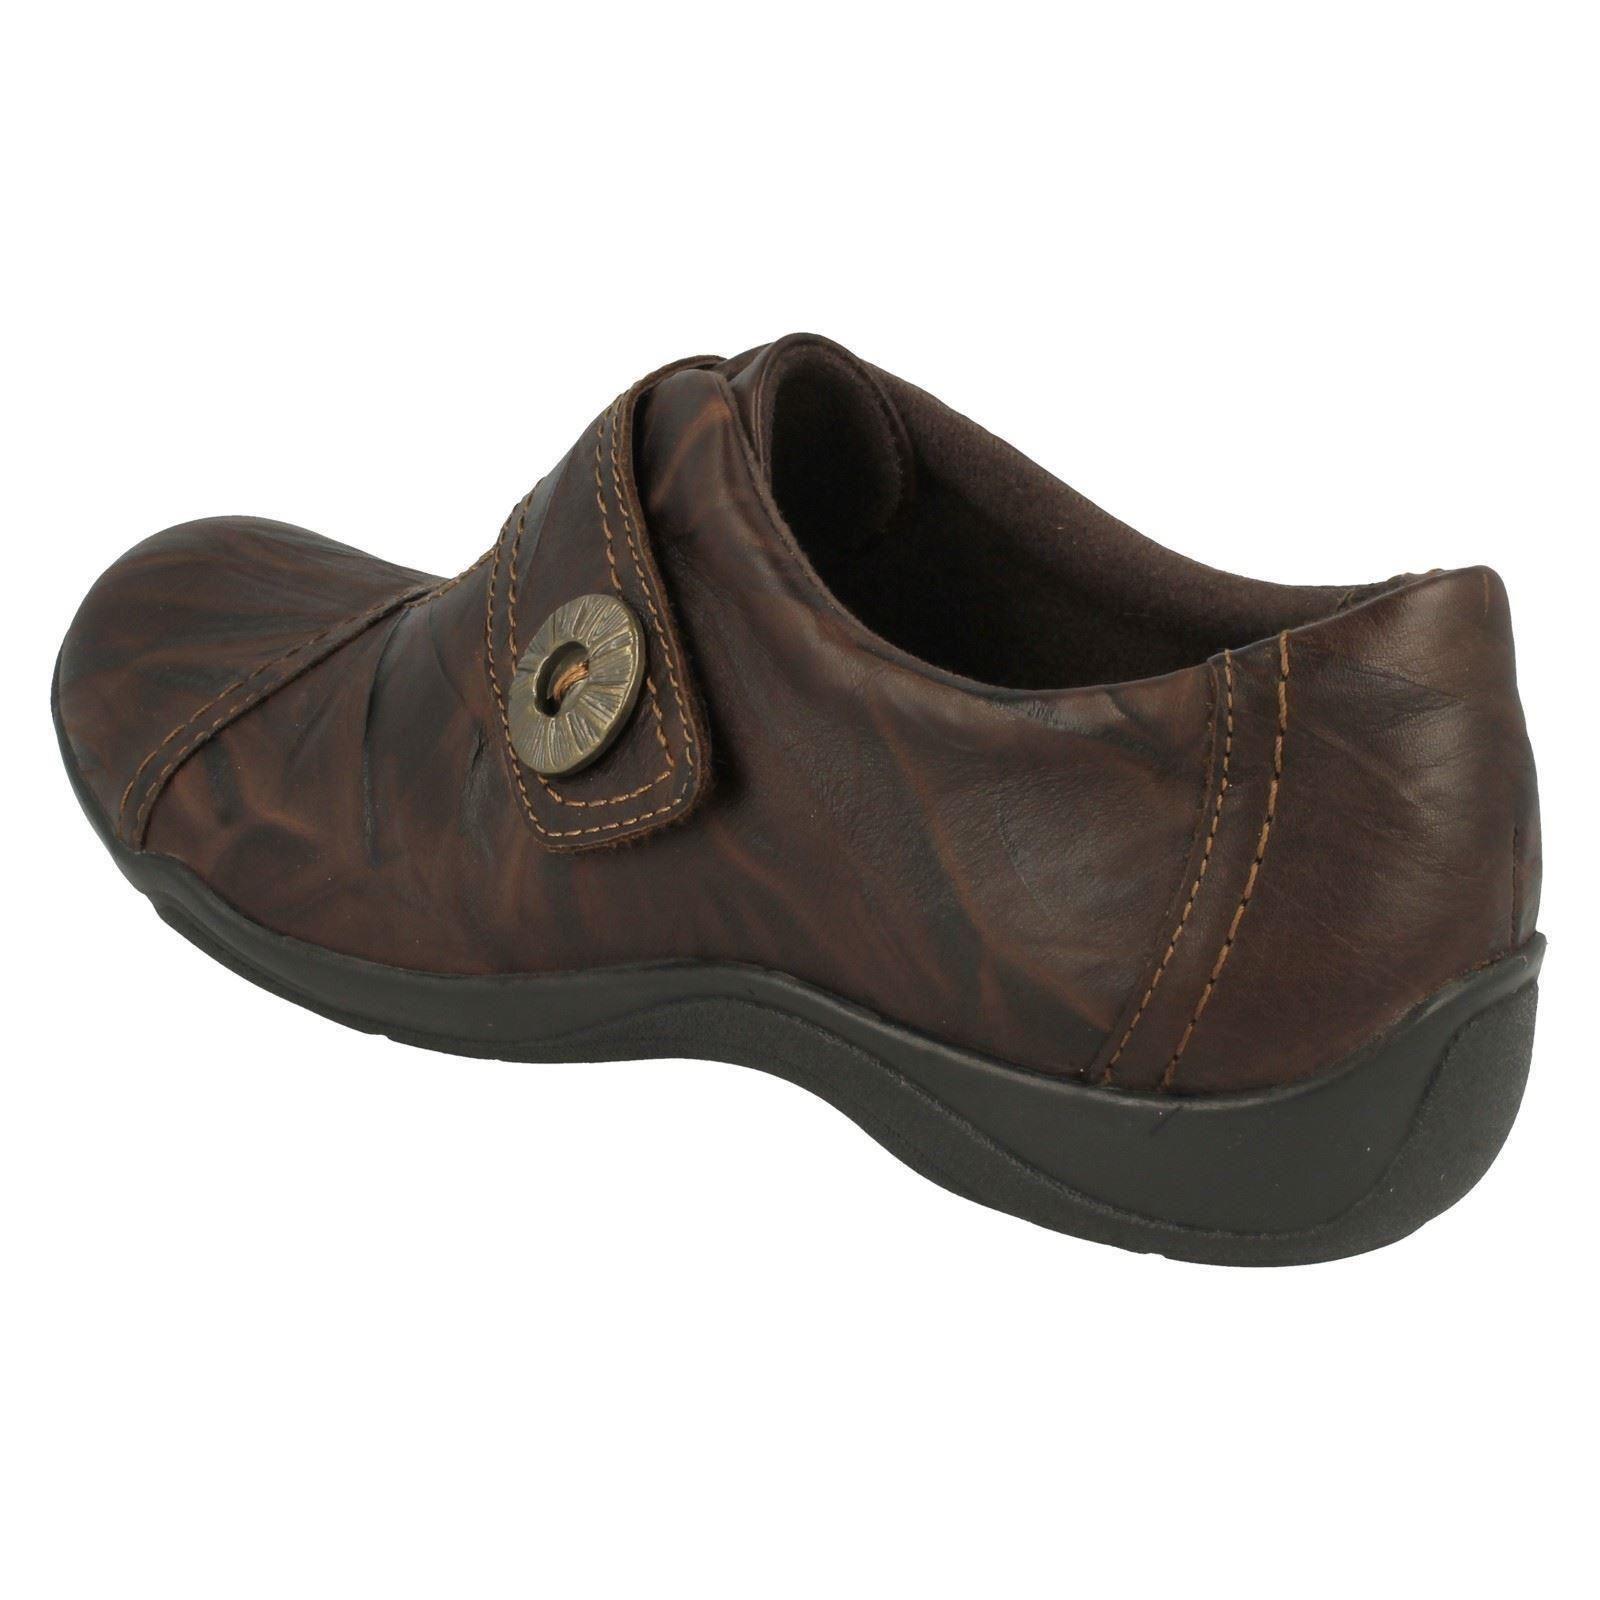 Damas Clarks Zapatos Informales 'Kelita Betty' Etiqueta ~ K